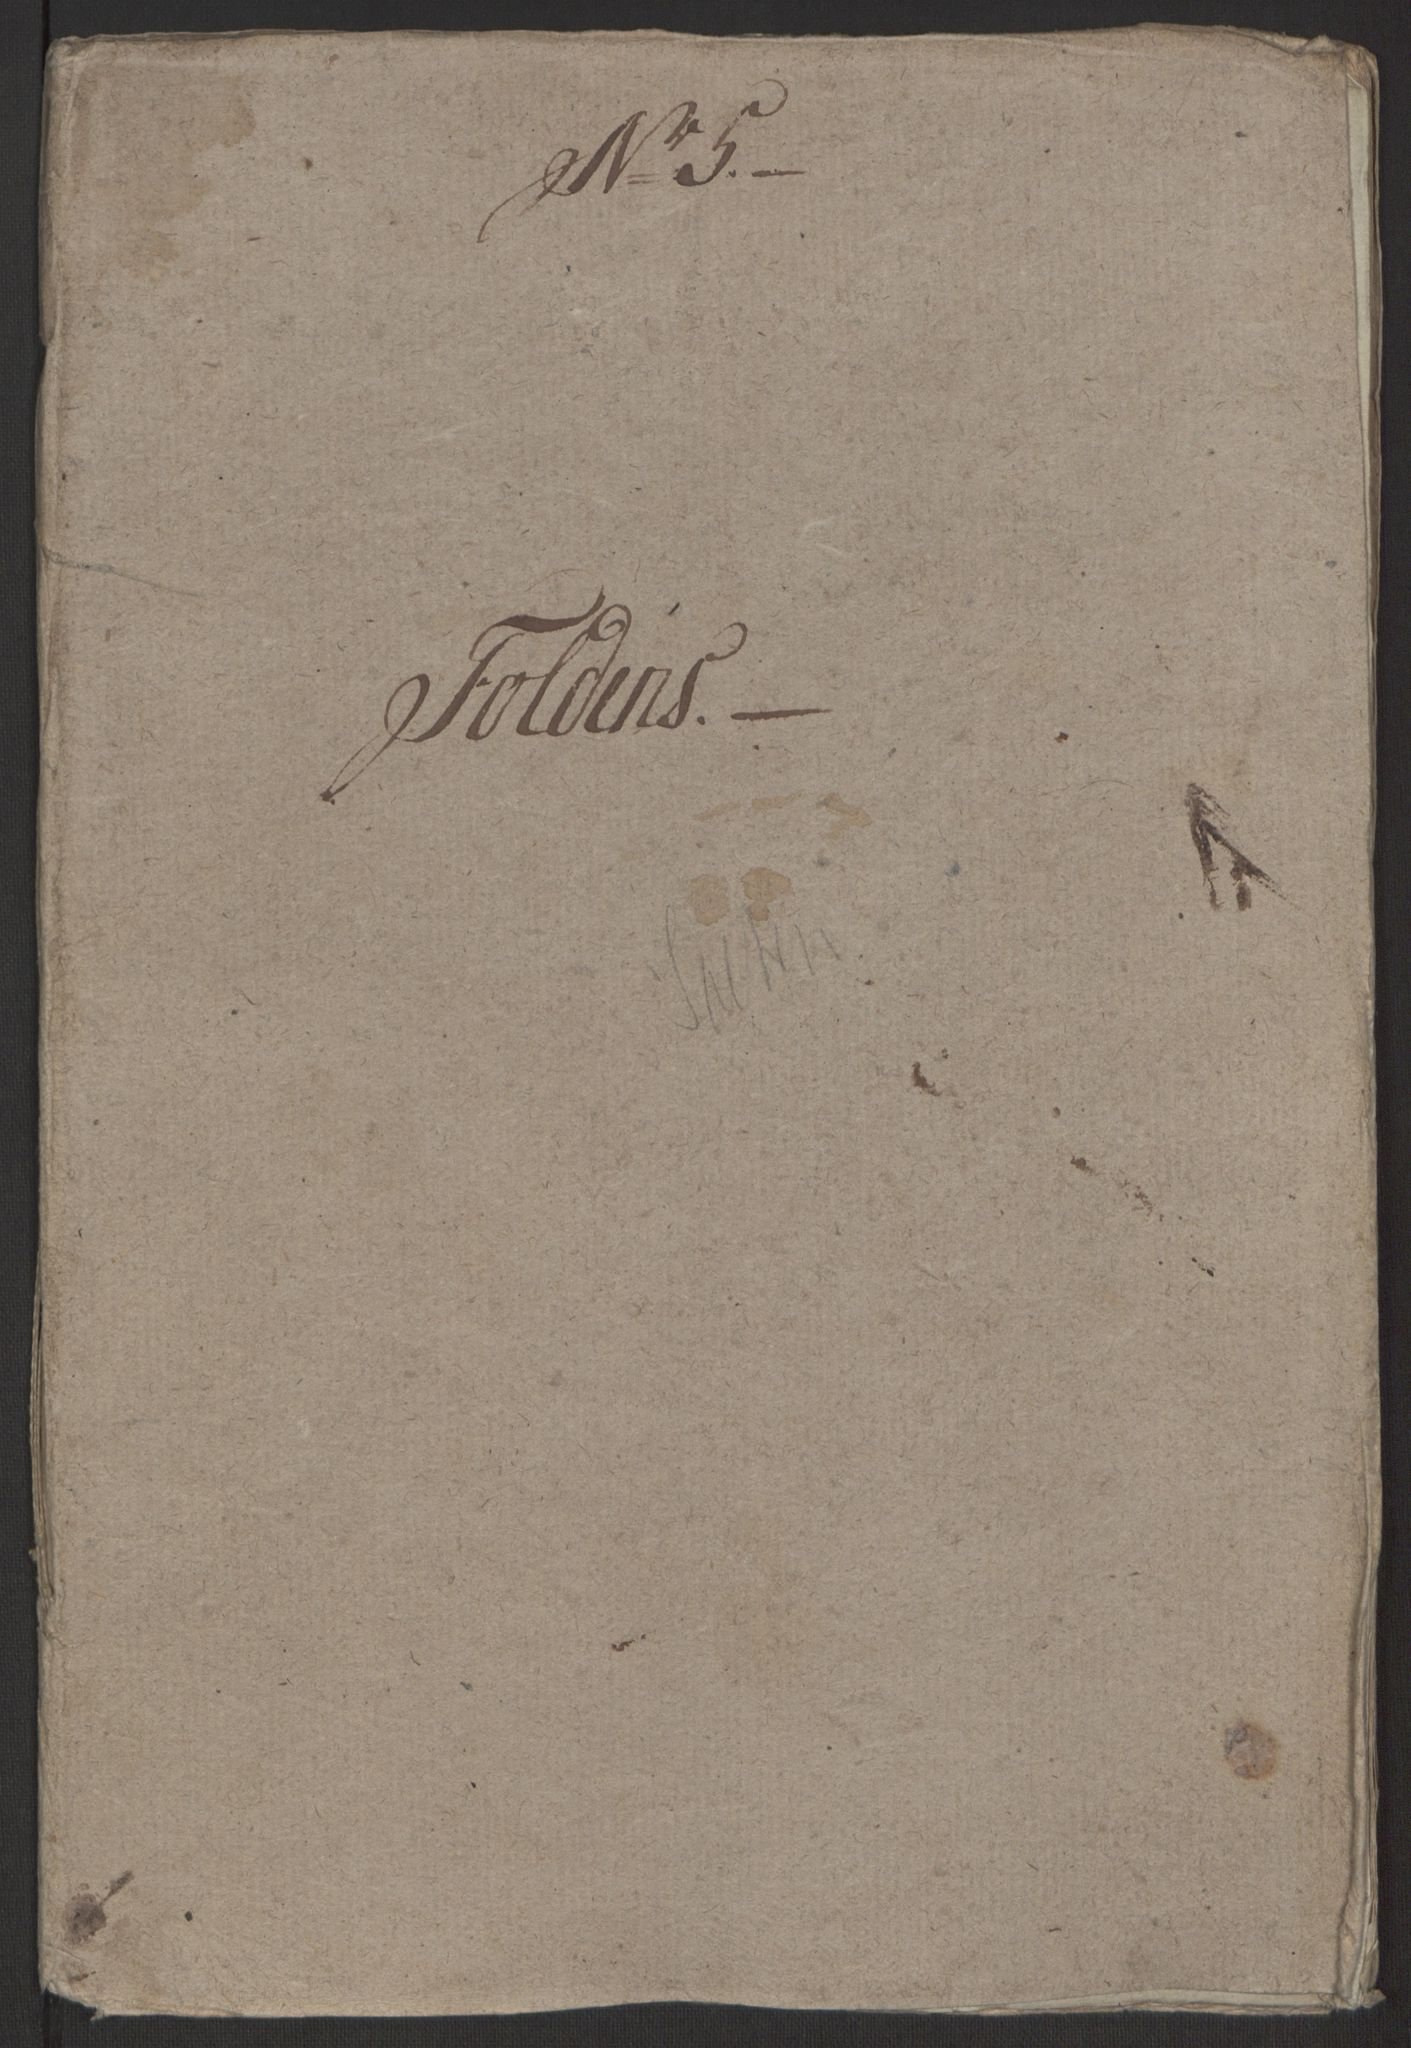 RA, Rentekammeret inntil 1814, Realistisk ordnet avdeling, Ol/L0022a: [Gg 10]: Ekstraskatten, 23.09.1762. Nordlands amt, 1762-1763, s. 85